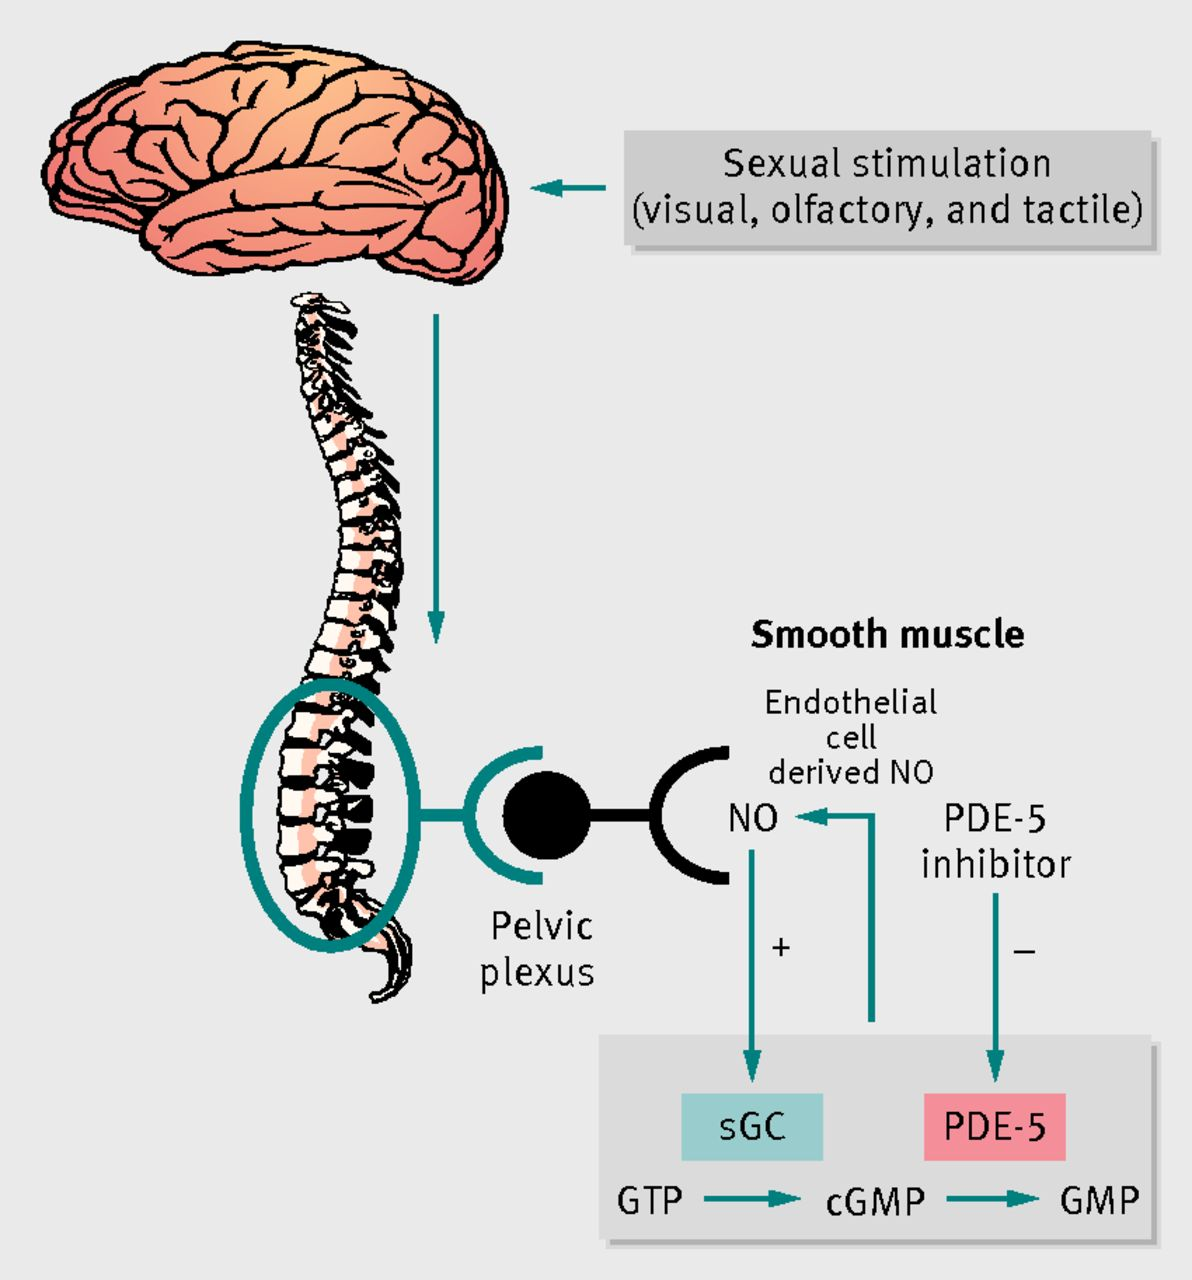 Organic sexual dysfunction